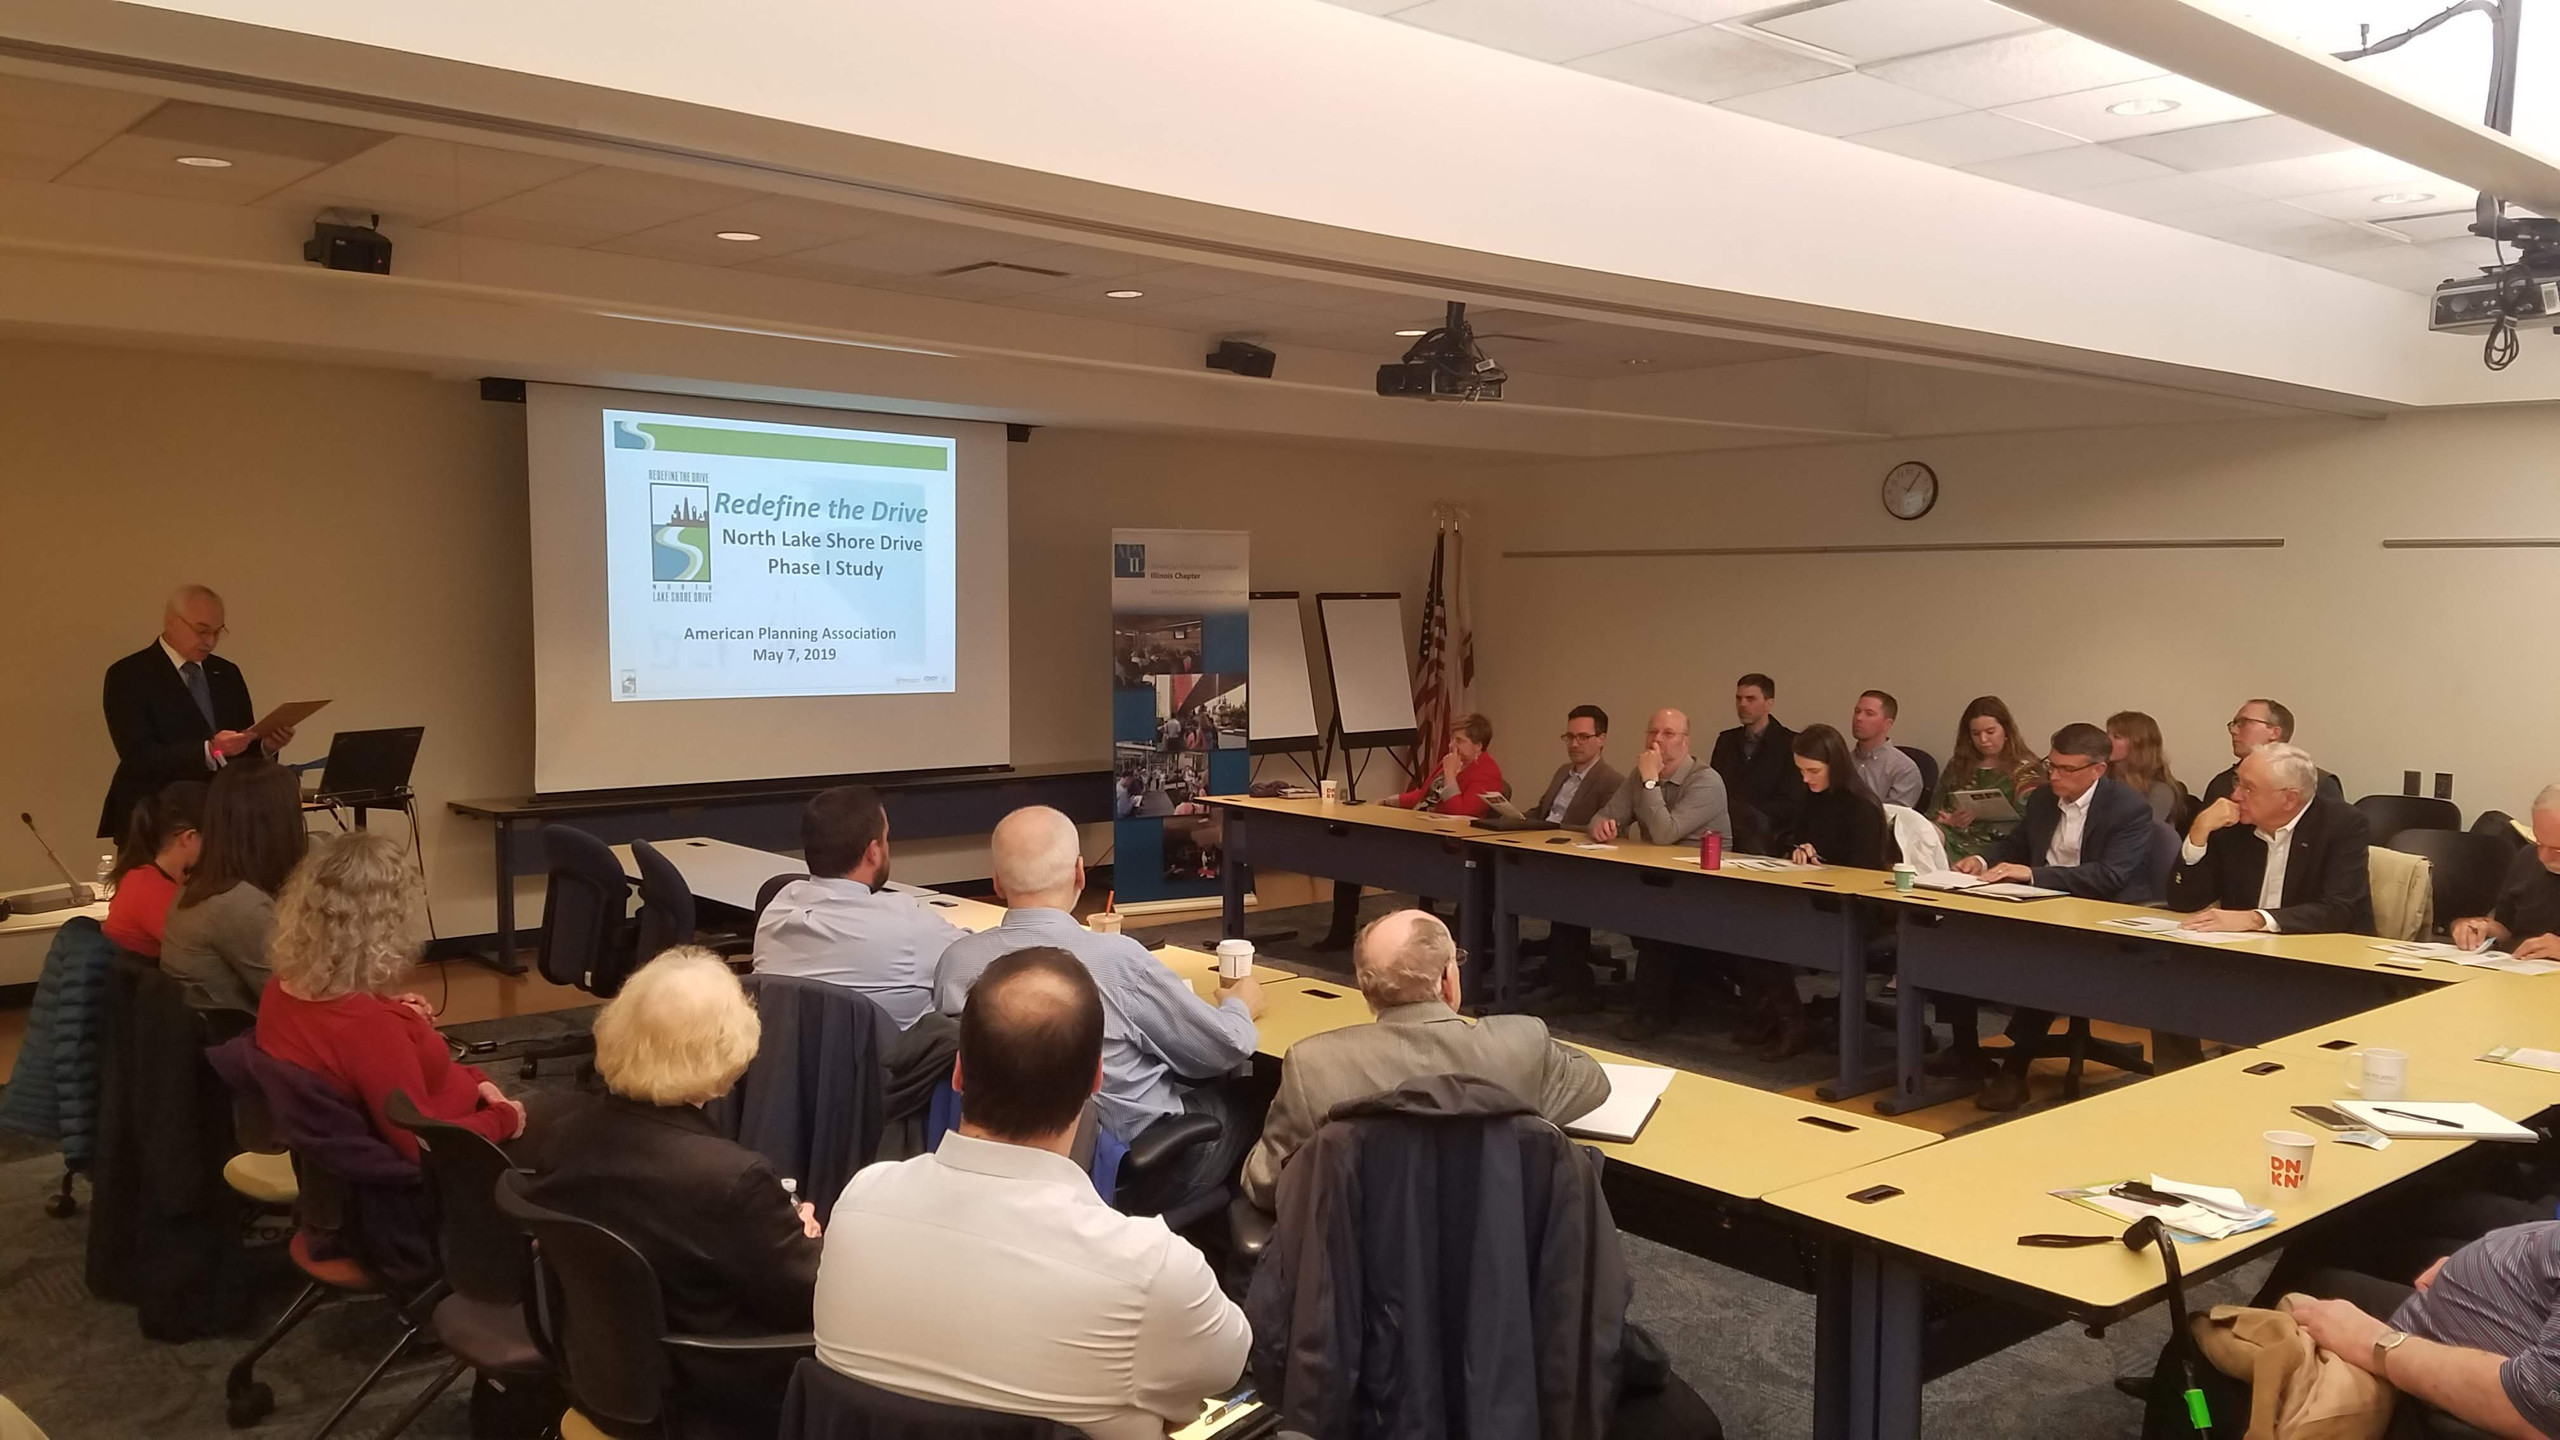 Moderator Mark Lundgren kicks off the 5/7/19 APA-CMS Redefine the Drive Program. (photo by Brandon Nolin, AICP)